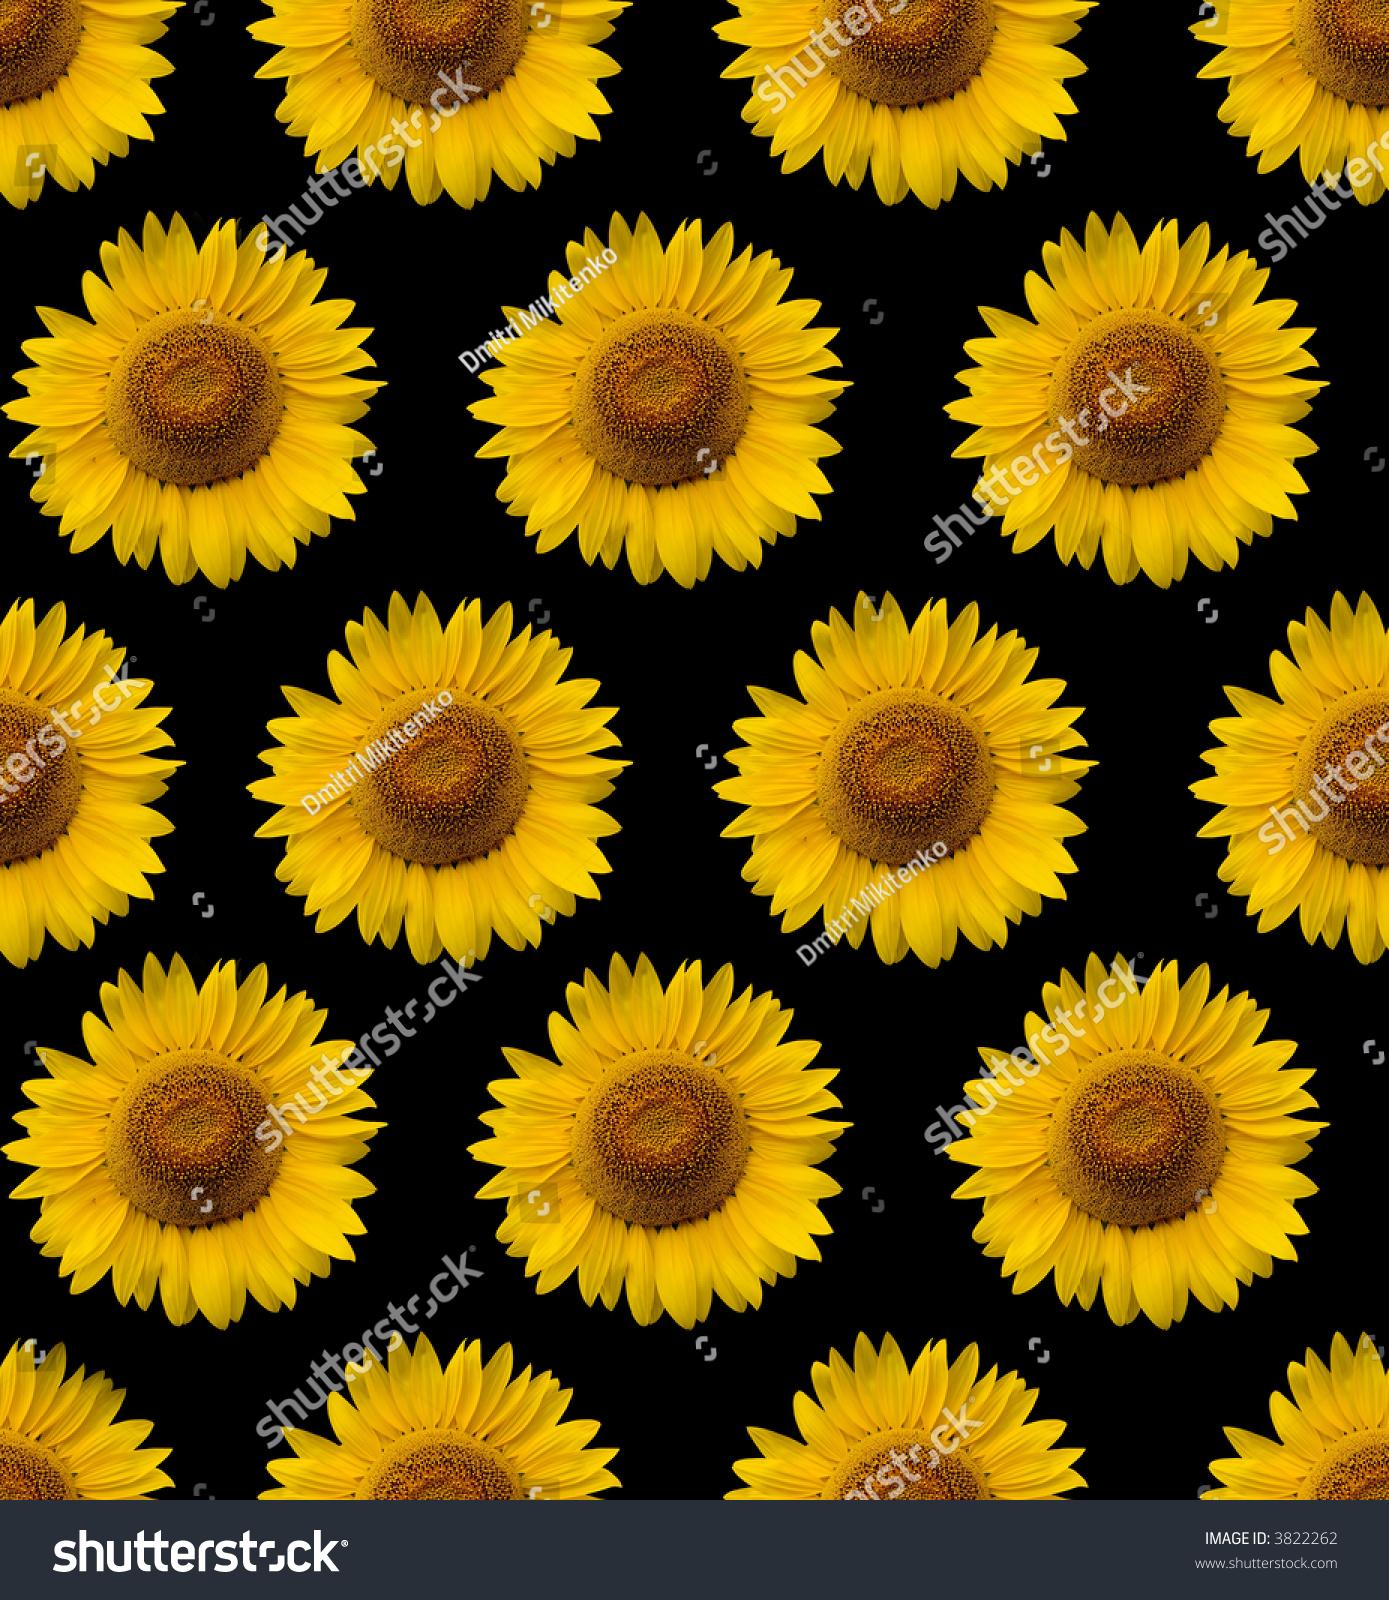 Sunflower Wallpaper Stock Photo 3822262 Shutterstock